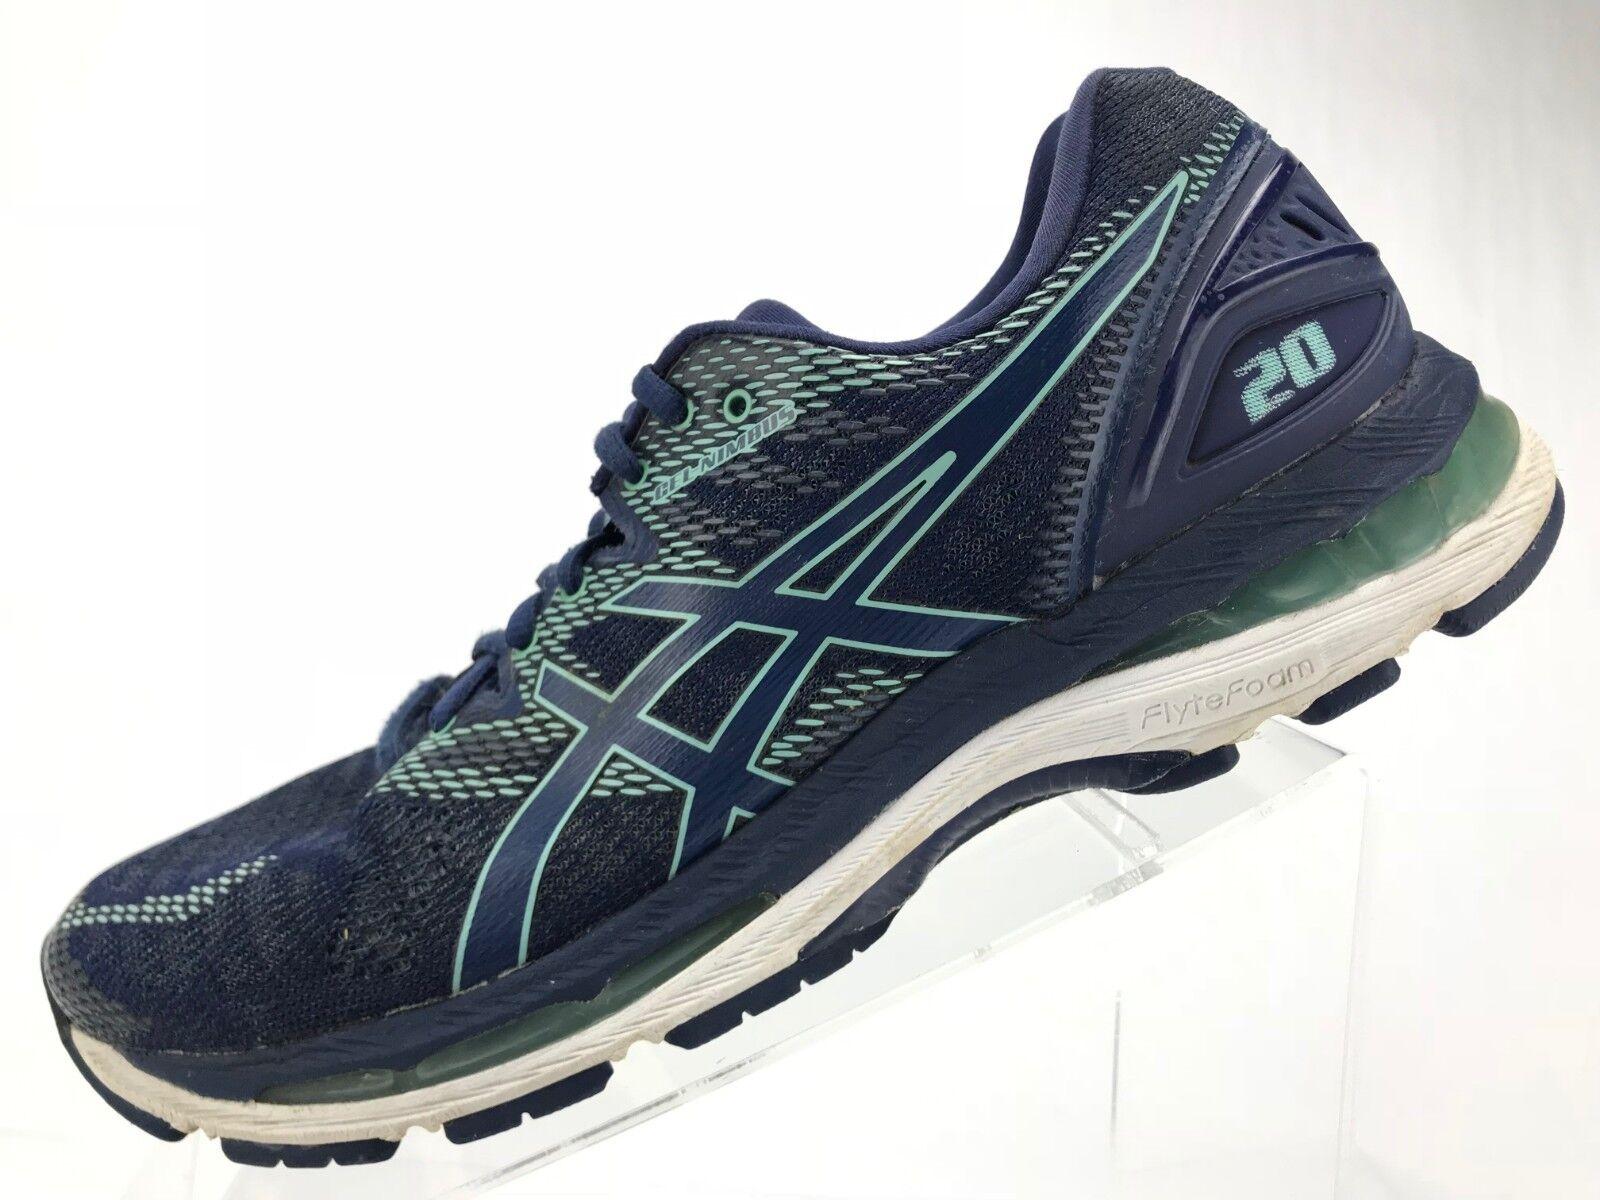 Asics Gel Nimbus 20 Running shoes - bluee Cross Training Sneakers Women's Size 11